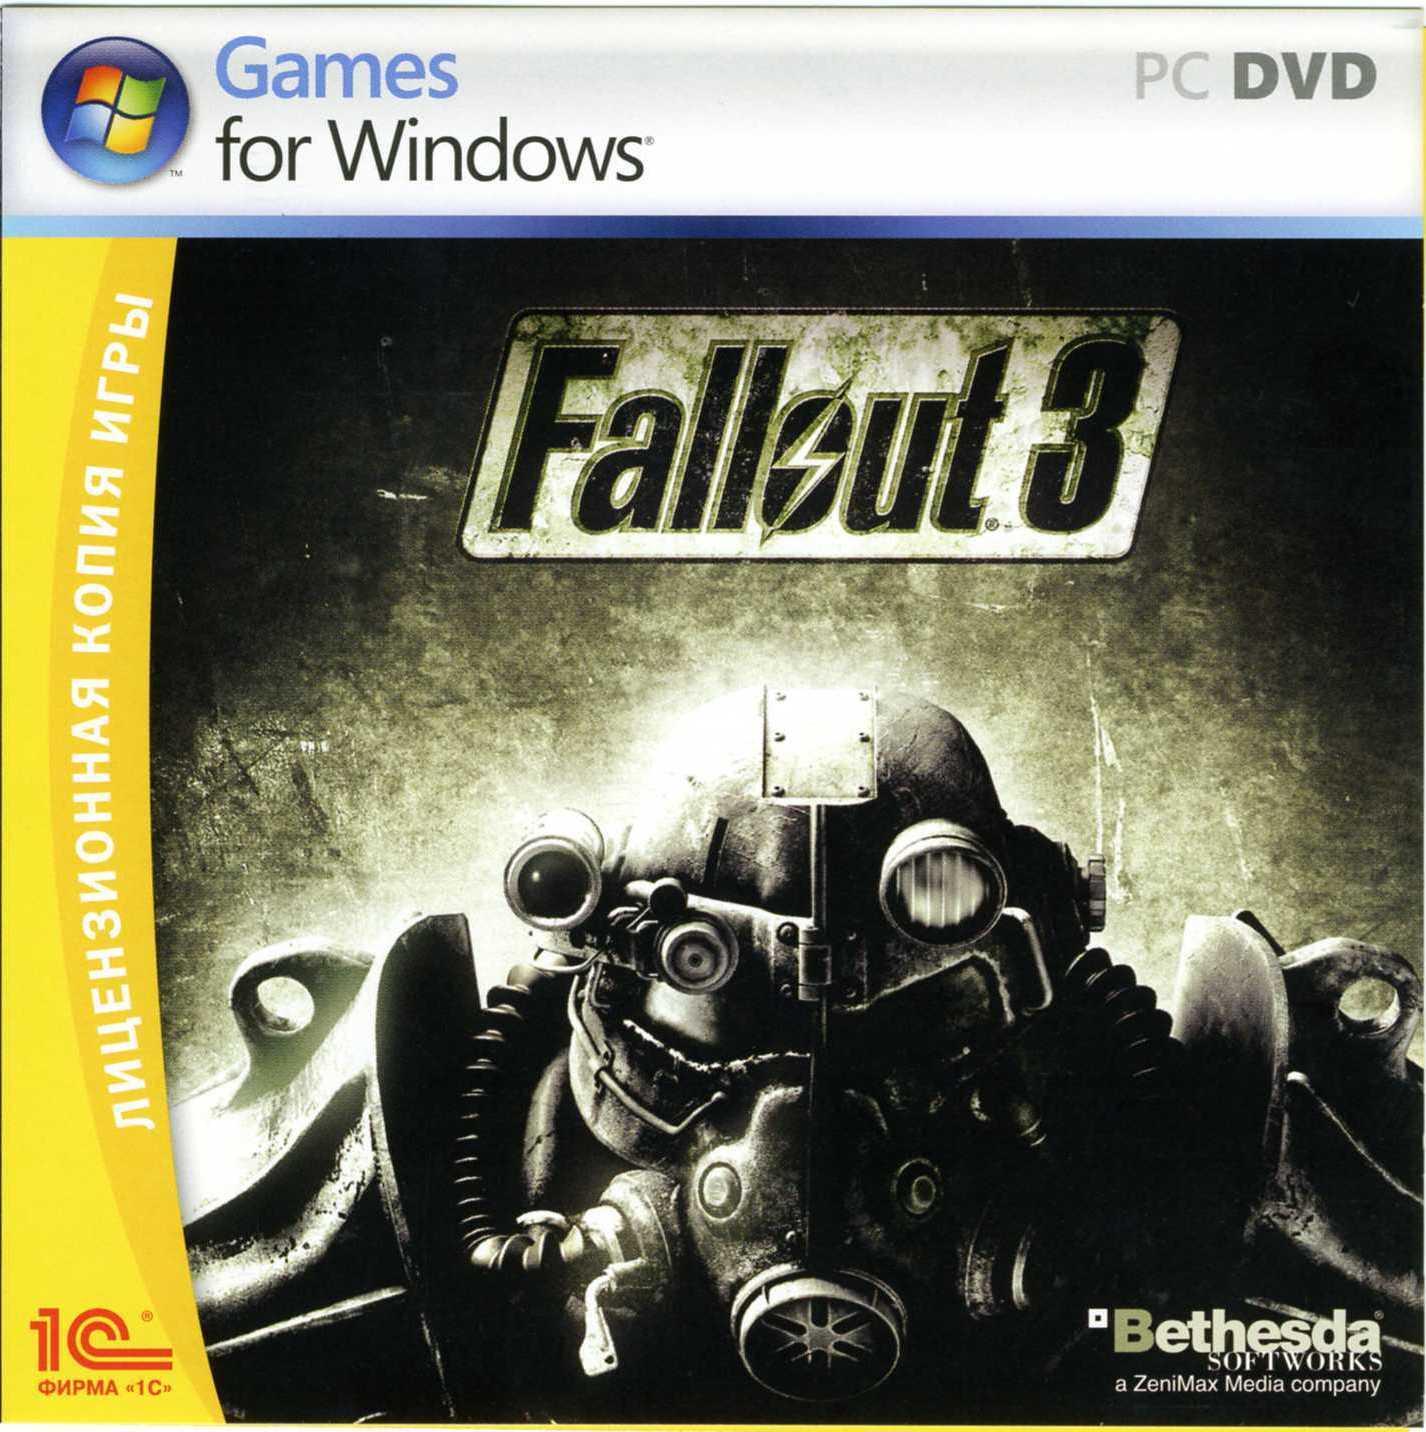 Название игры Fallout 3 Версия v1.5 EN Release Group/Person